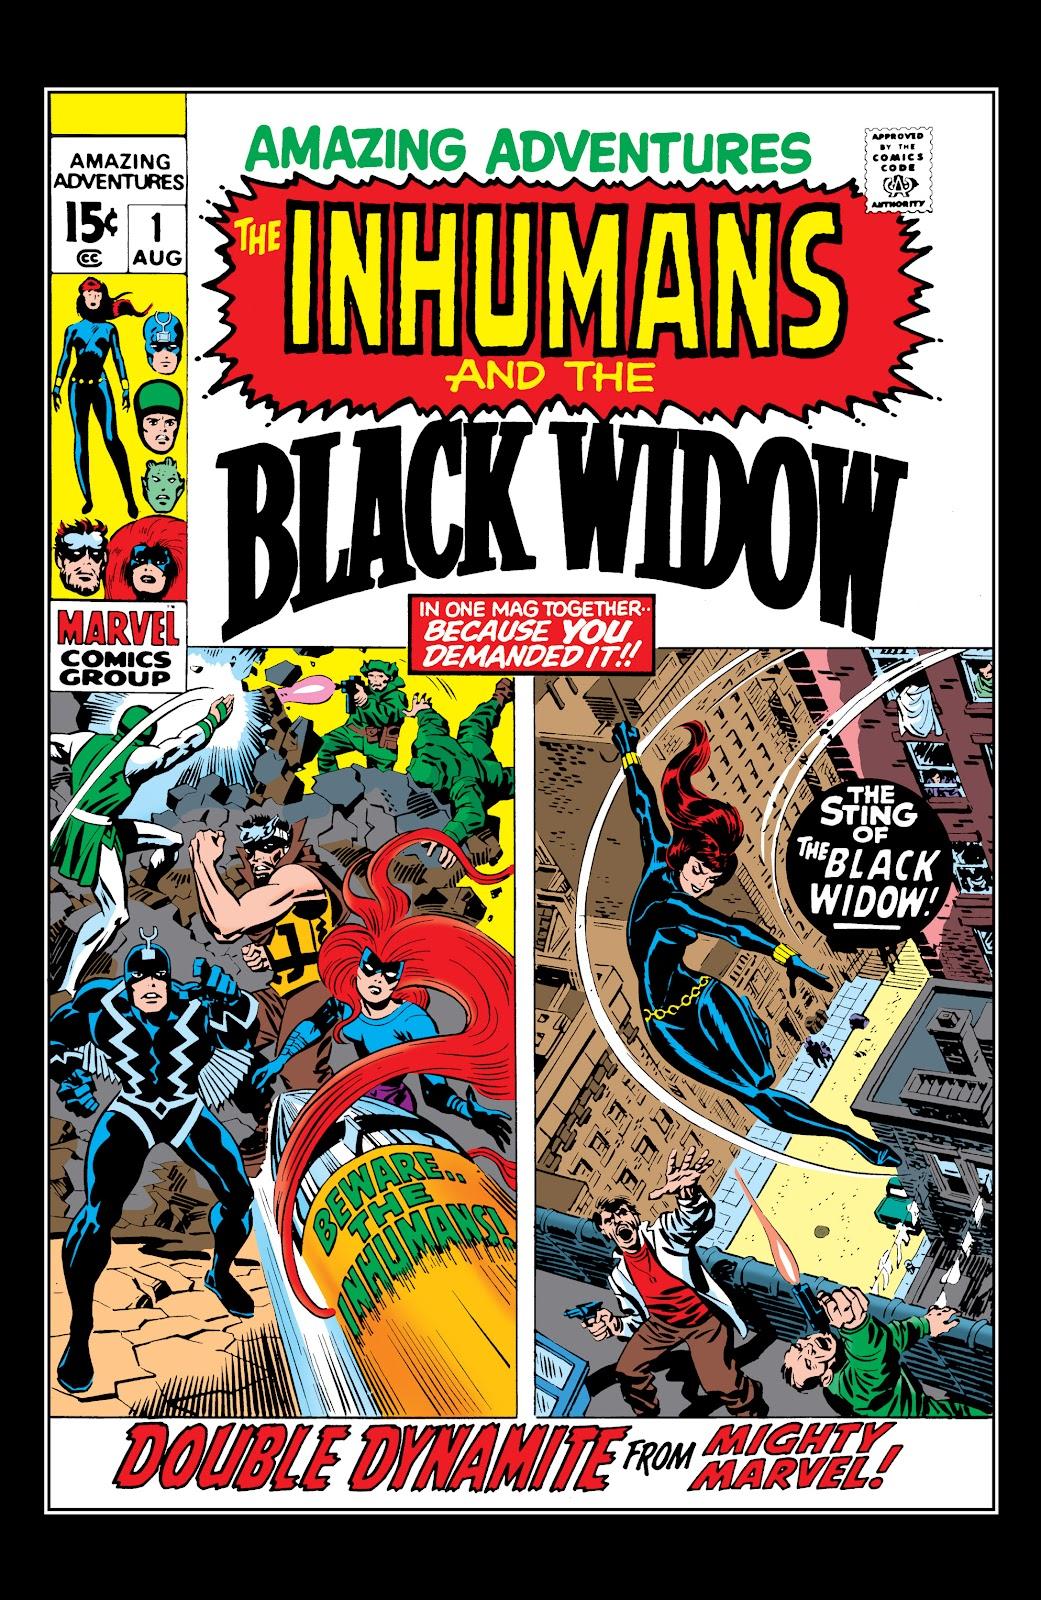 Read online Marvel Masterworks: The Inhumans comic -  Issue # TPB 1 (Part 1) - 69